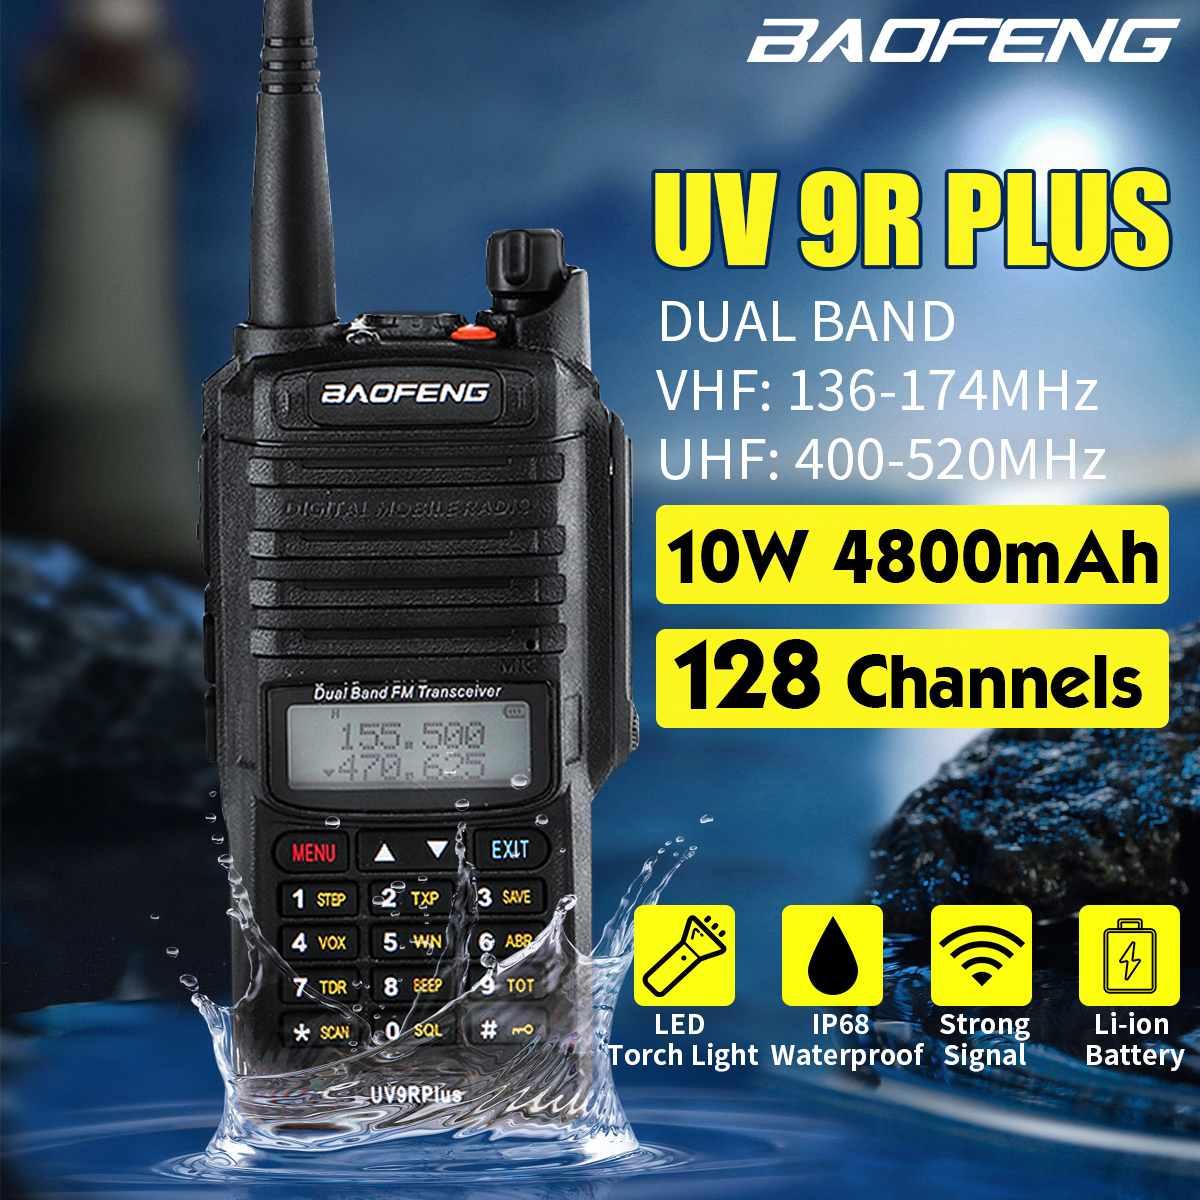 6in1 BaoFeng UV-9R Plus Waterproof Handheld Walkie Talkie 10W UHF VHF Dual Band IP67 HF Transceiver UV 9R Portable Radio US Plug